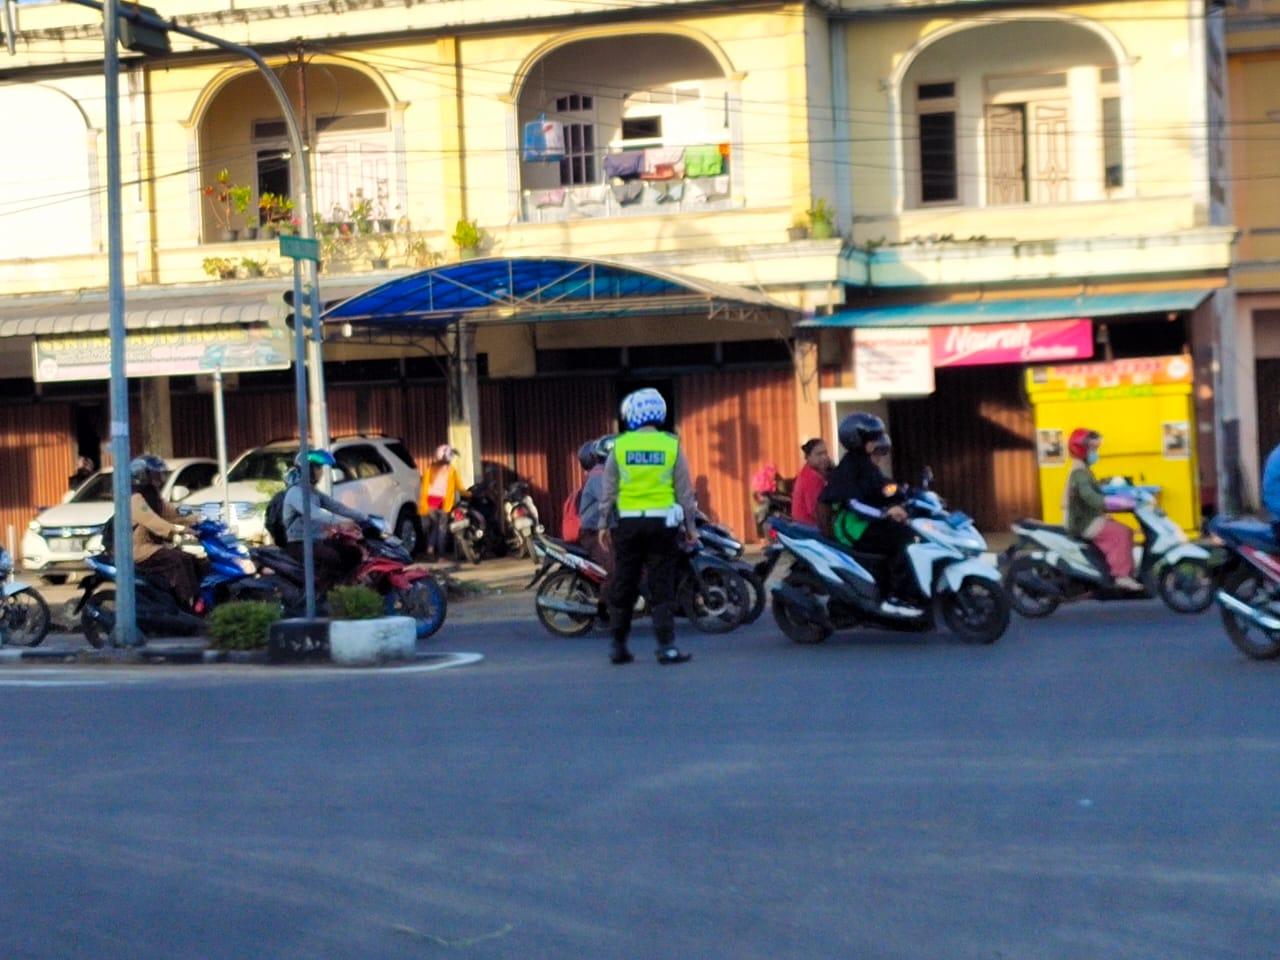 Gatur Lalin Pagi Hari, Wujud Komitmen dan Loyalitas Pelayanan Polisi Kepada Masyarakat